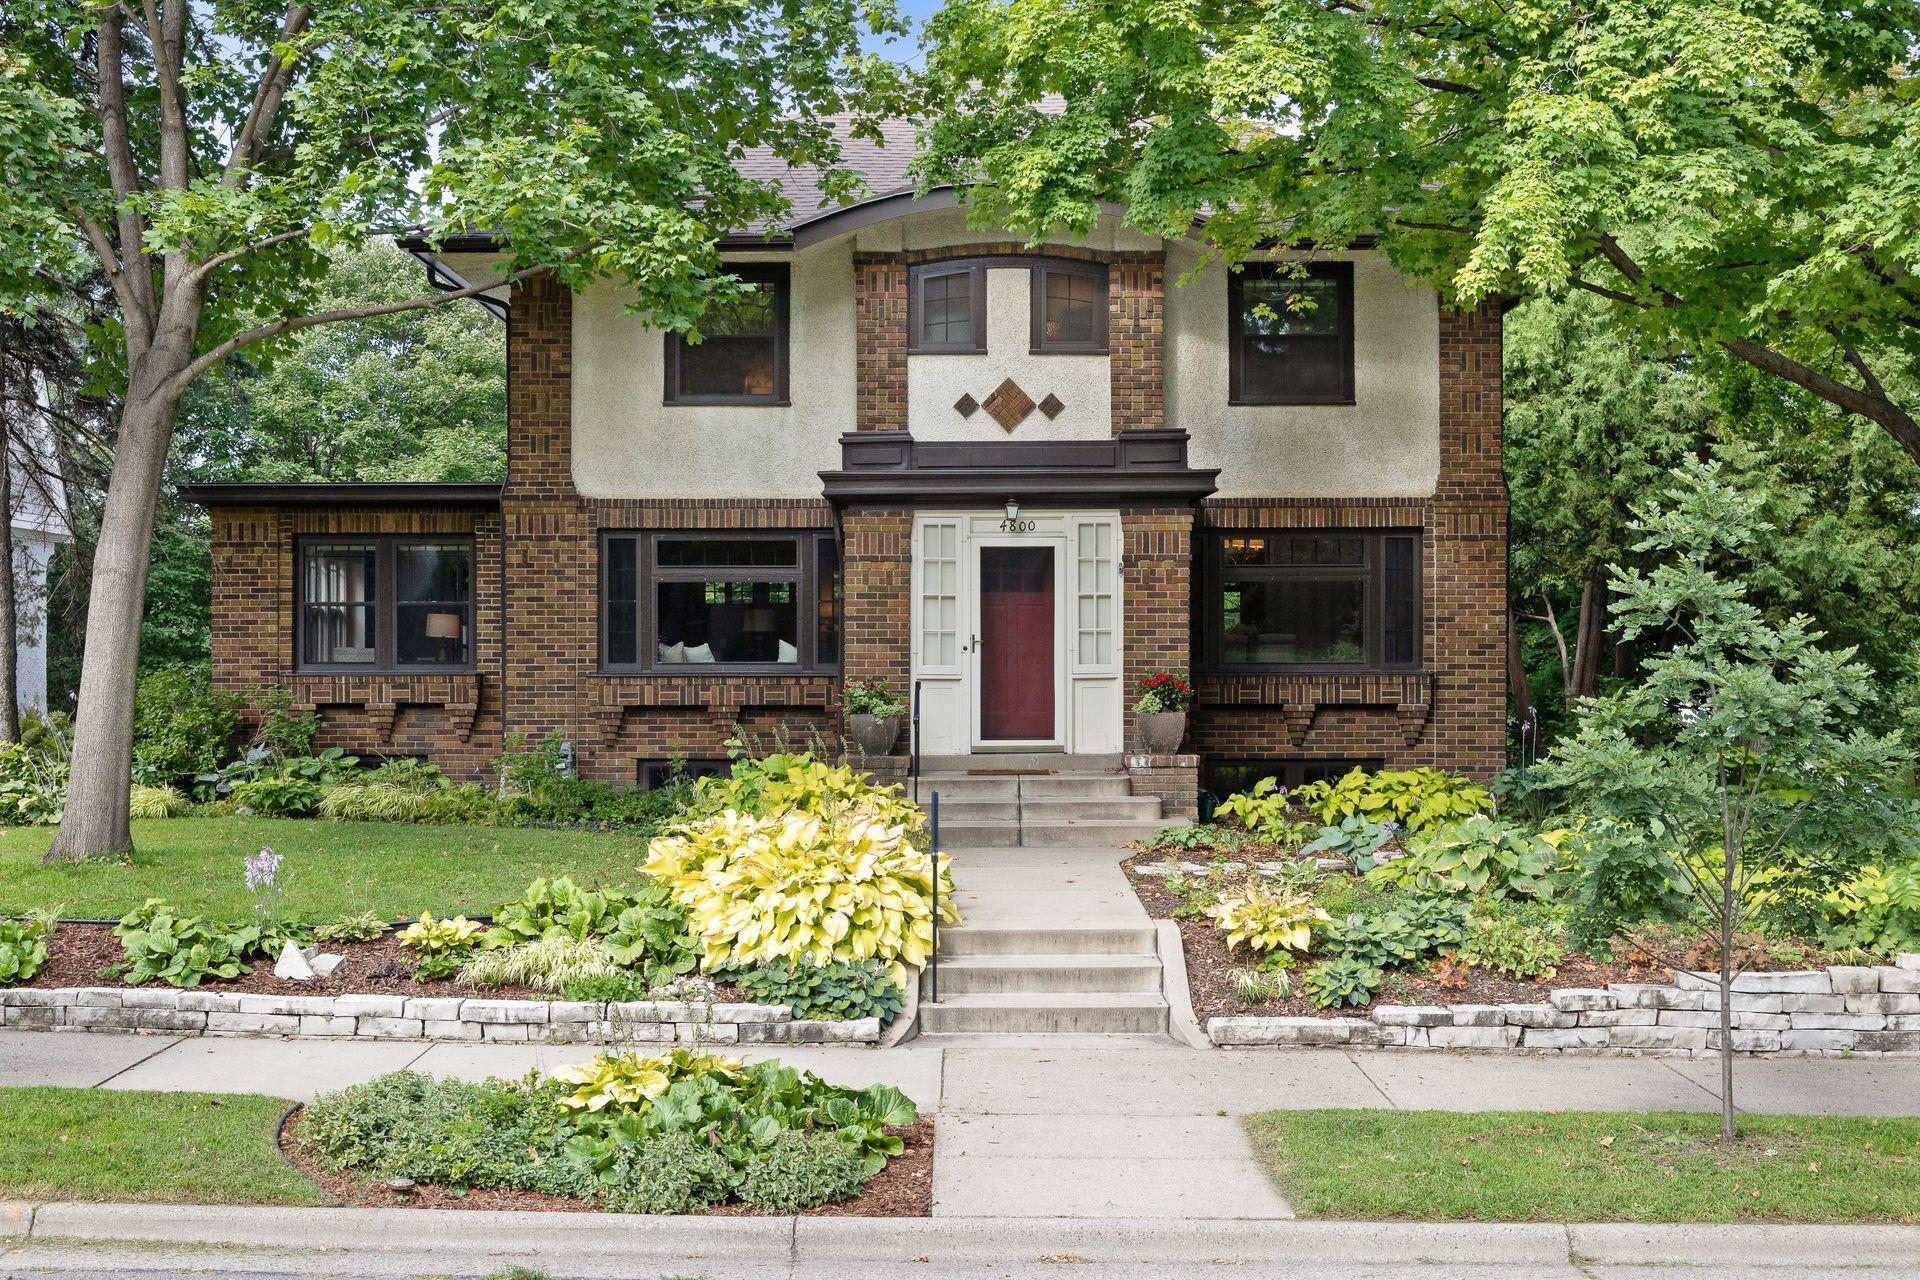 4800 Colfax Avenue S Property Photo - Minneapolis, MN real estate listing